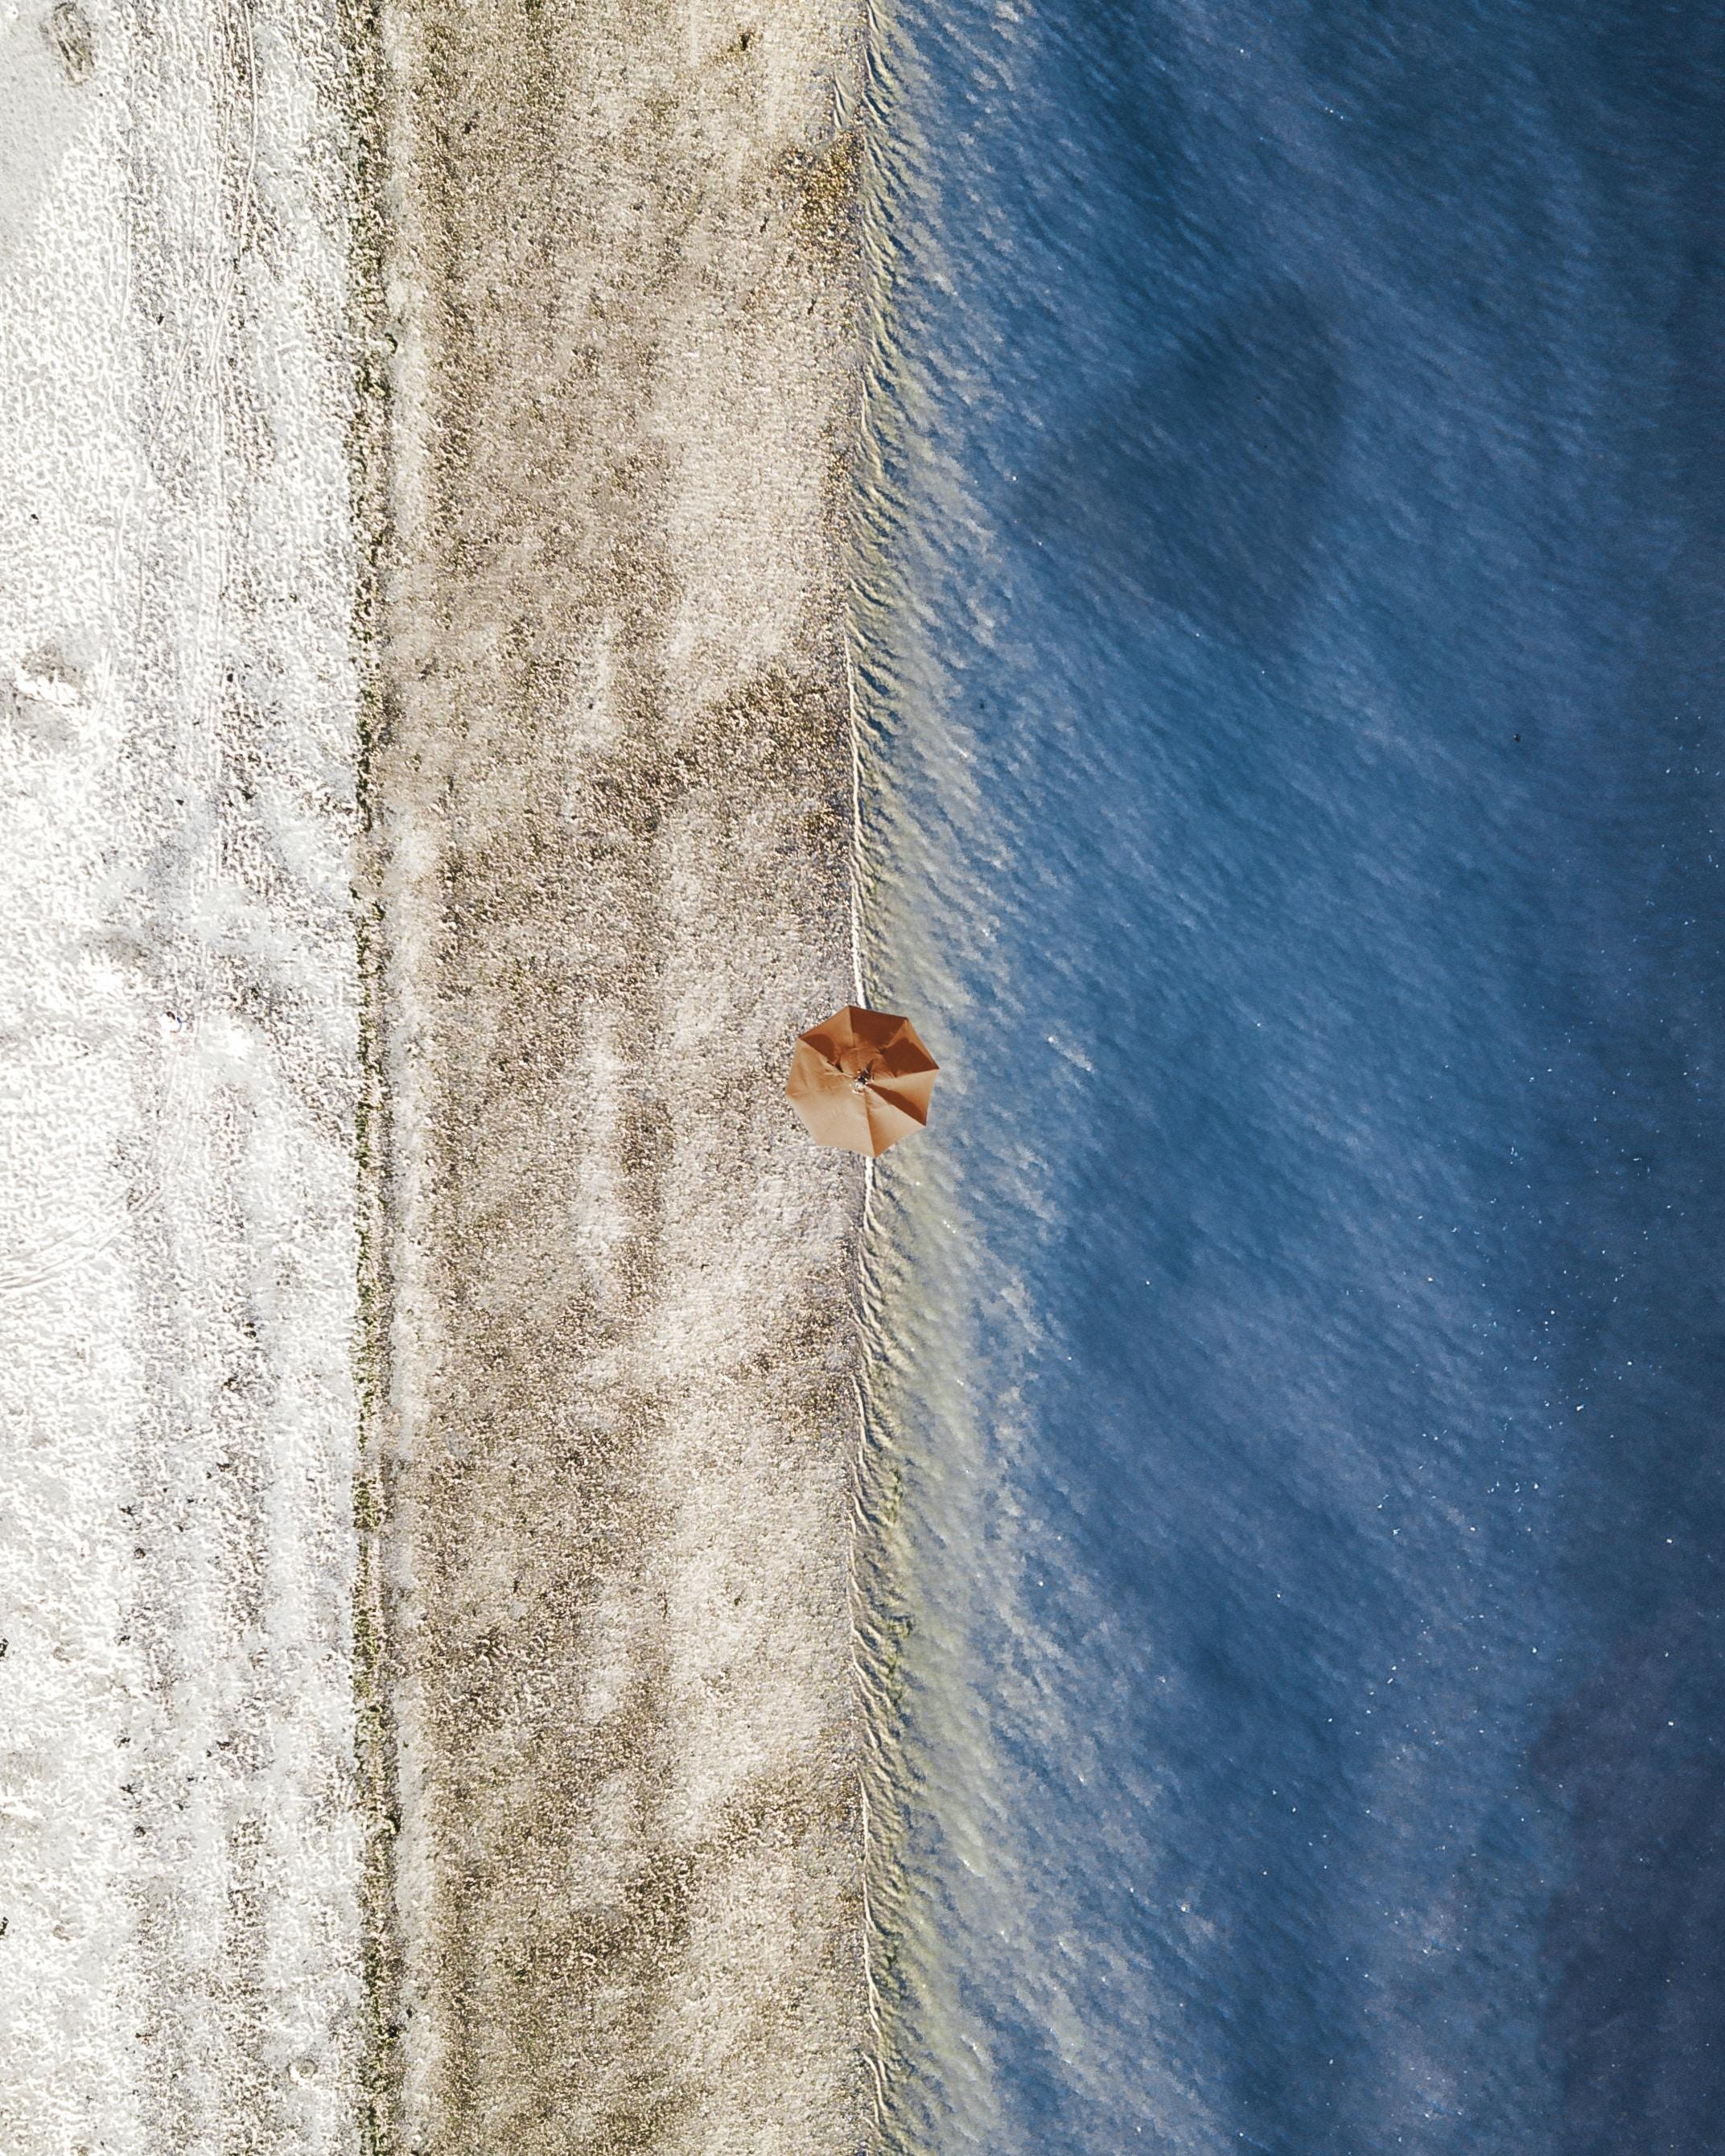 aerial photograph of orange umbrella near body of water